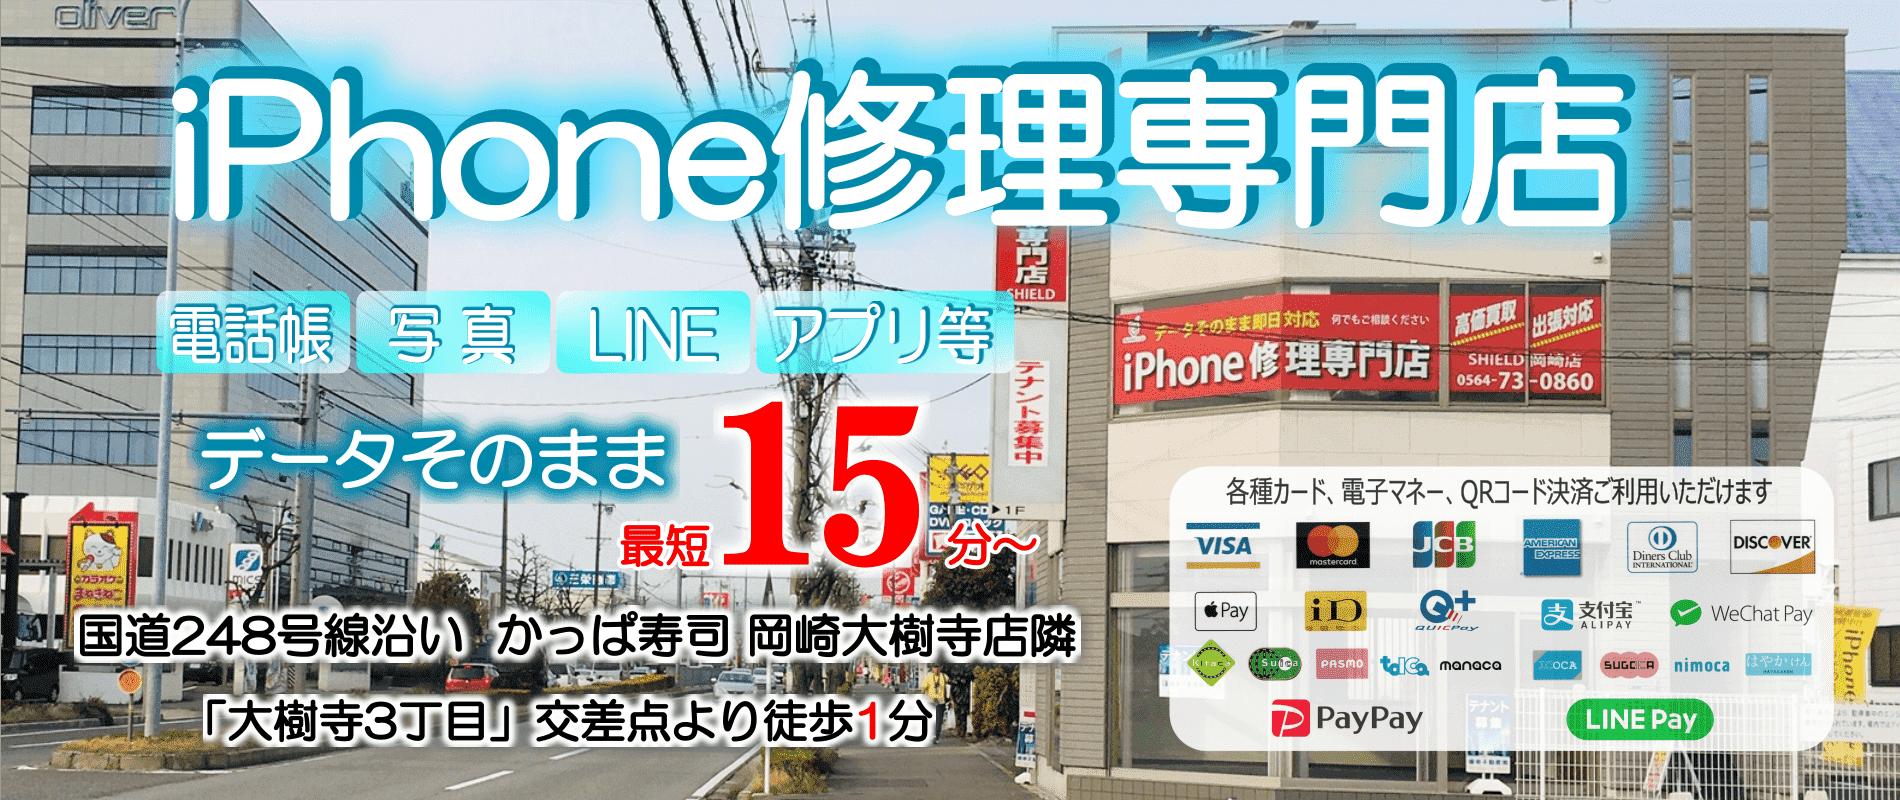 iPhone修理買取専門SHIELD岡崎店